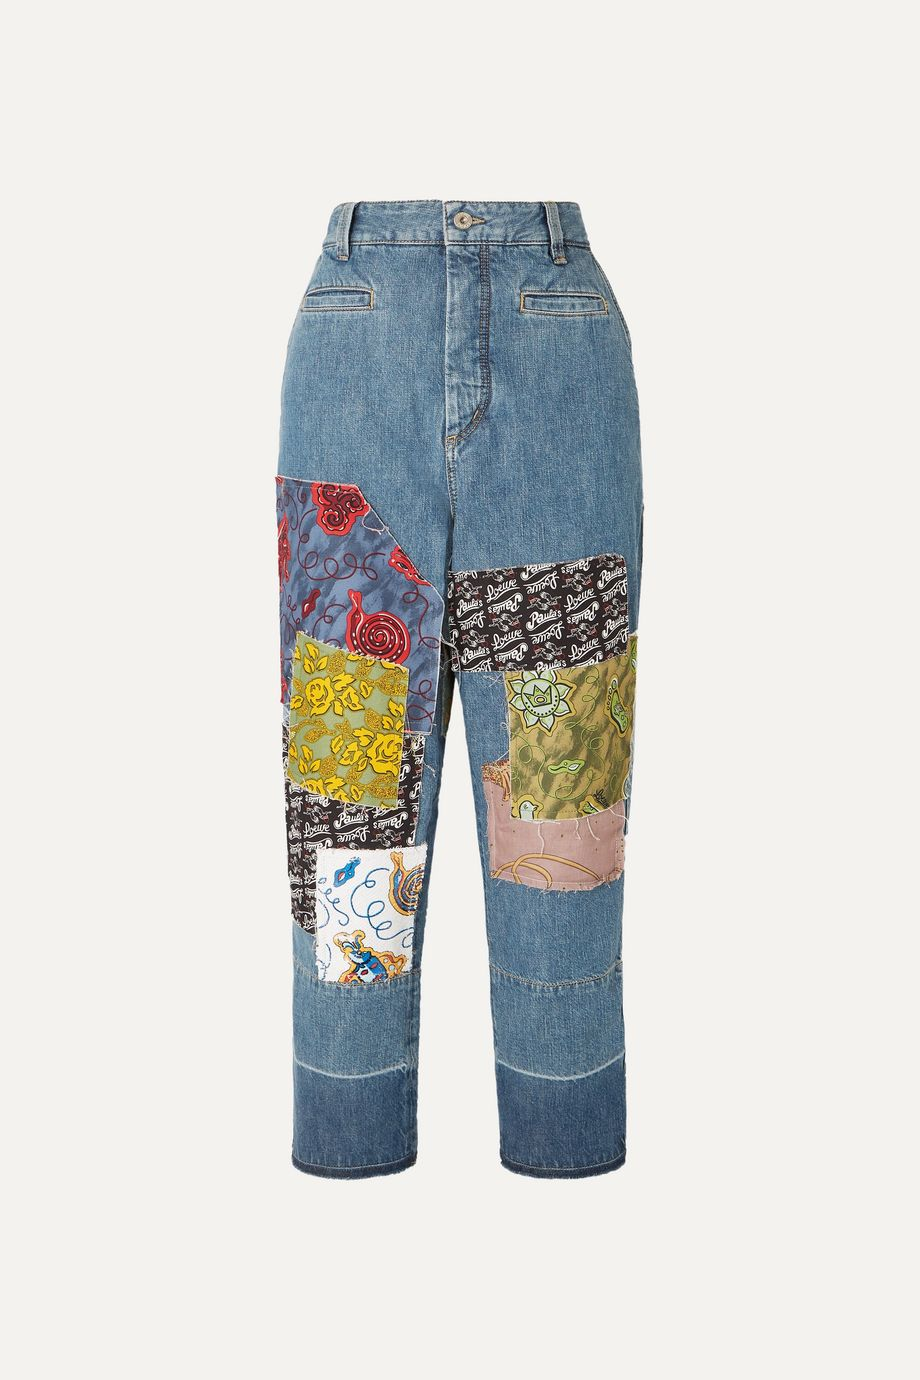 Loewe + Paula's Ibiza cropped patchwork boyfriend jeans